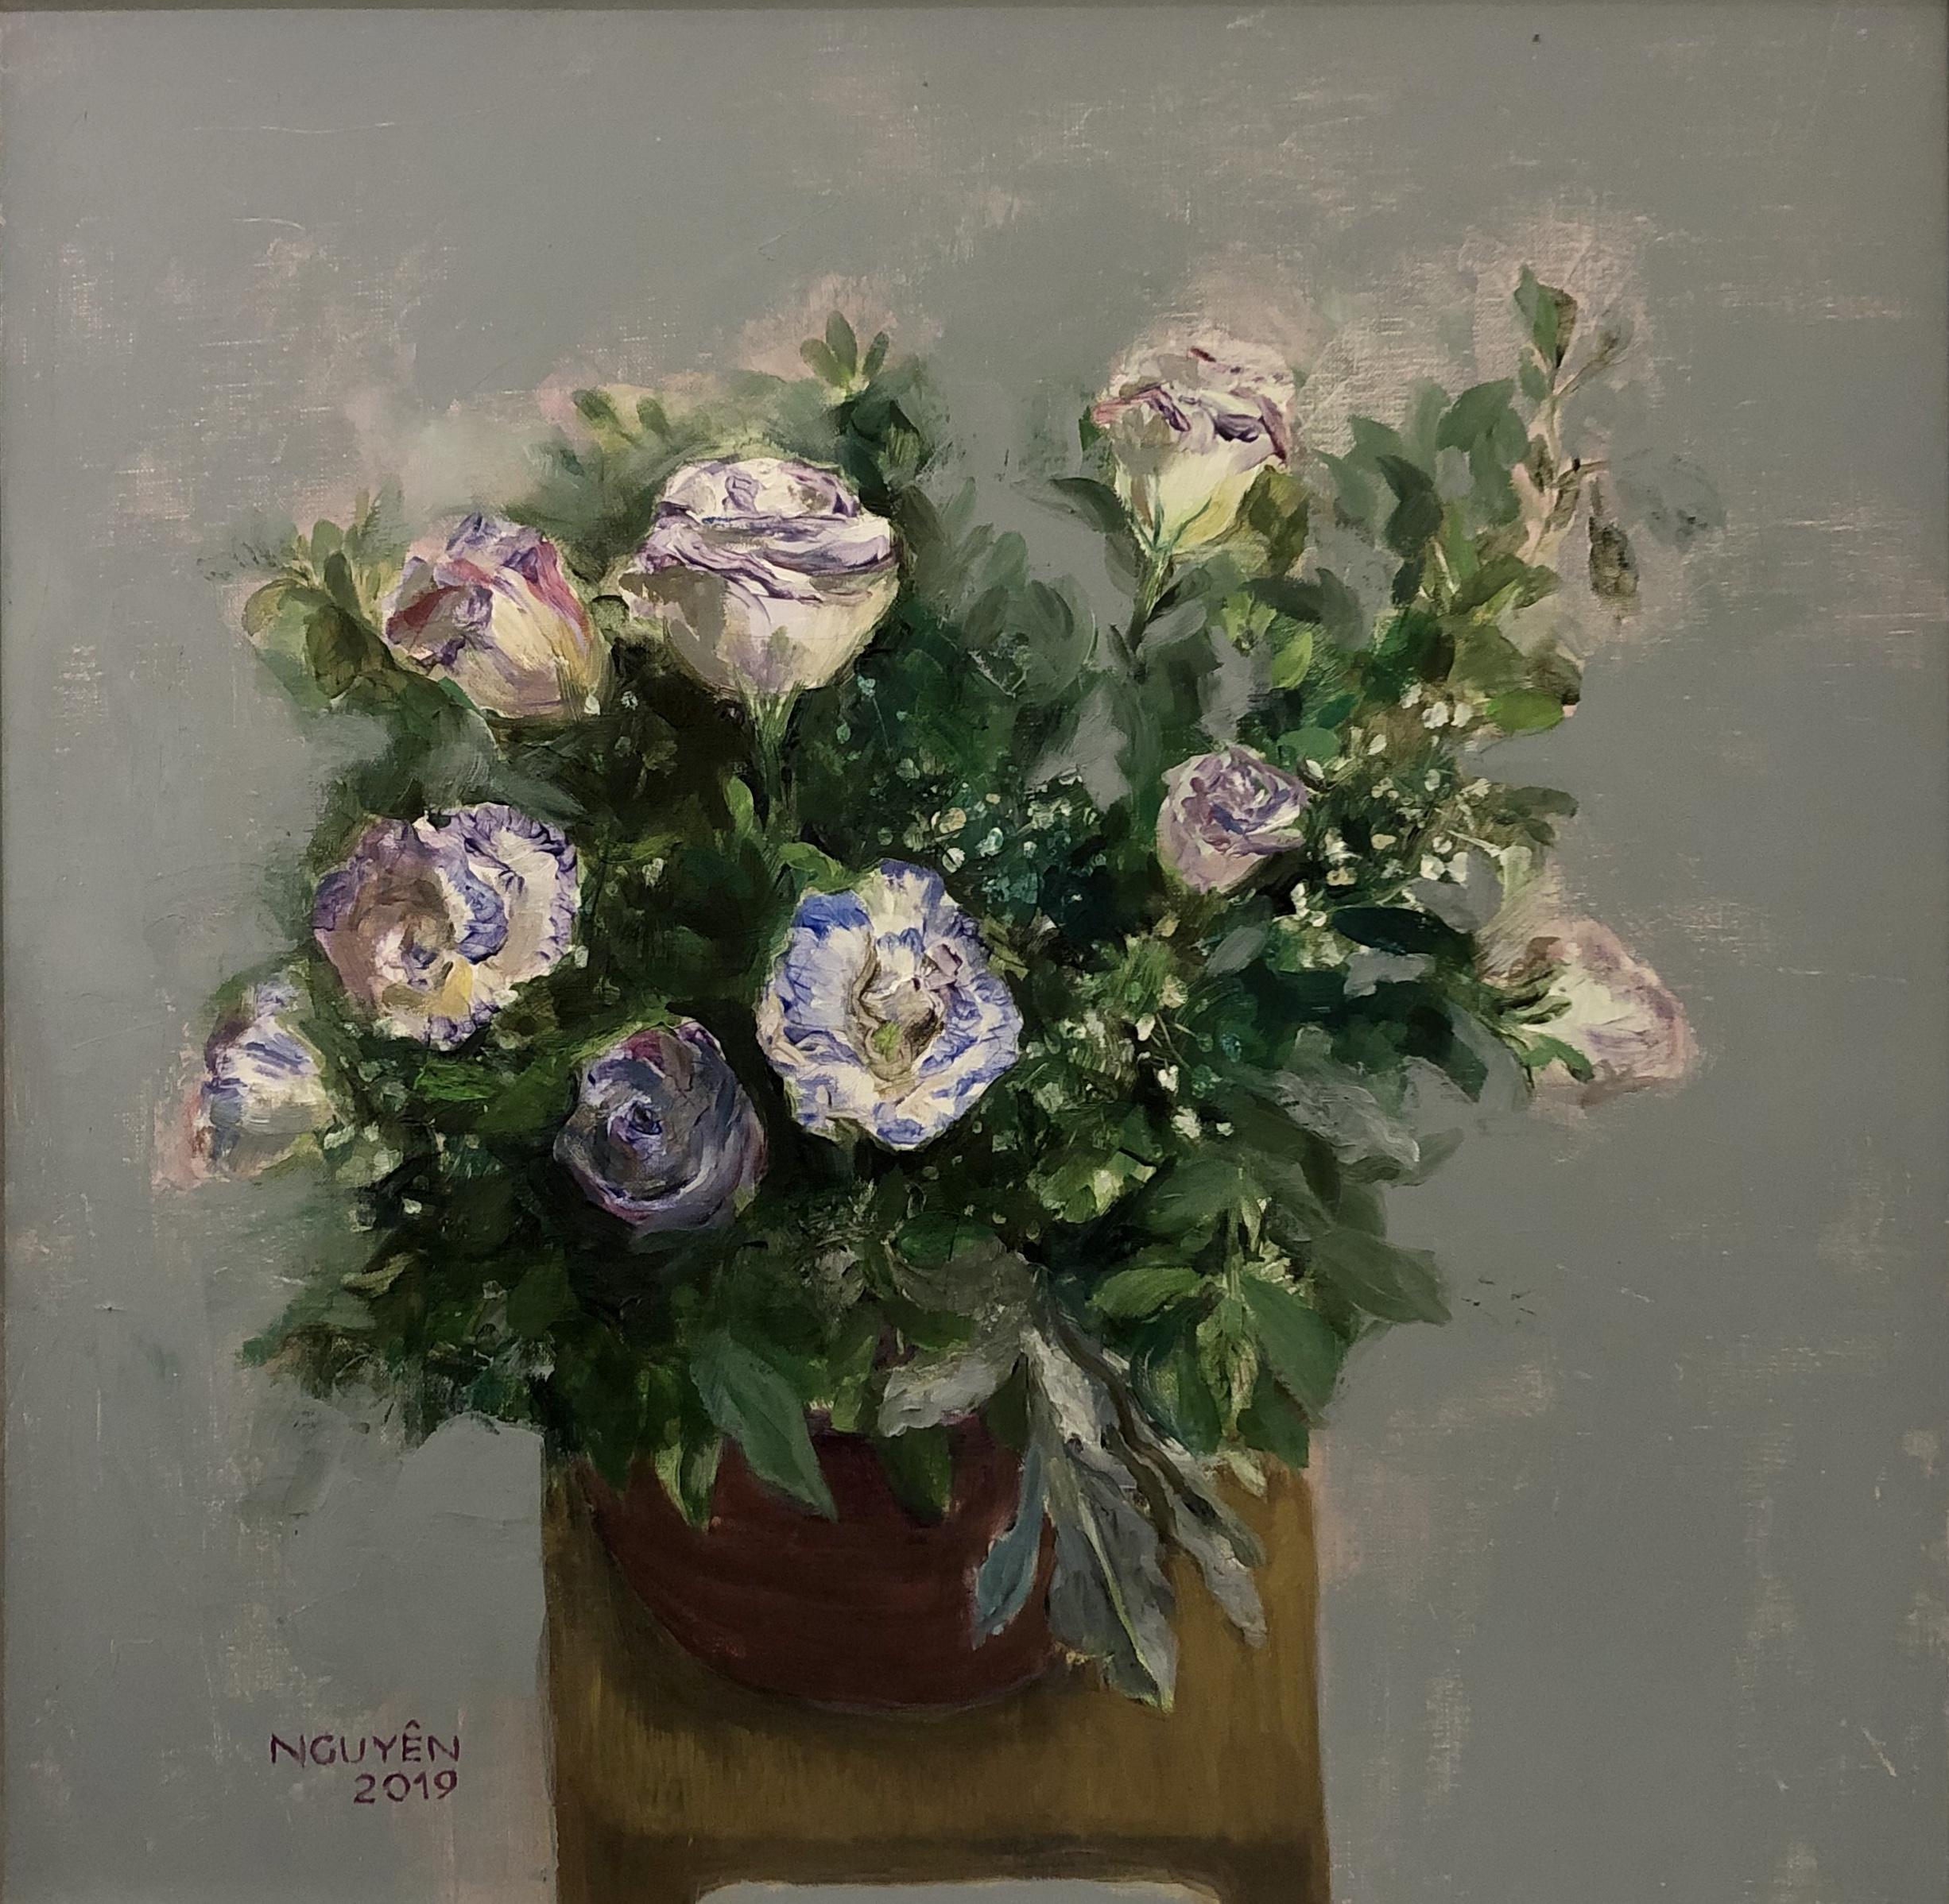 December Auspicious Flowers | Cát Tường Tháng 12